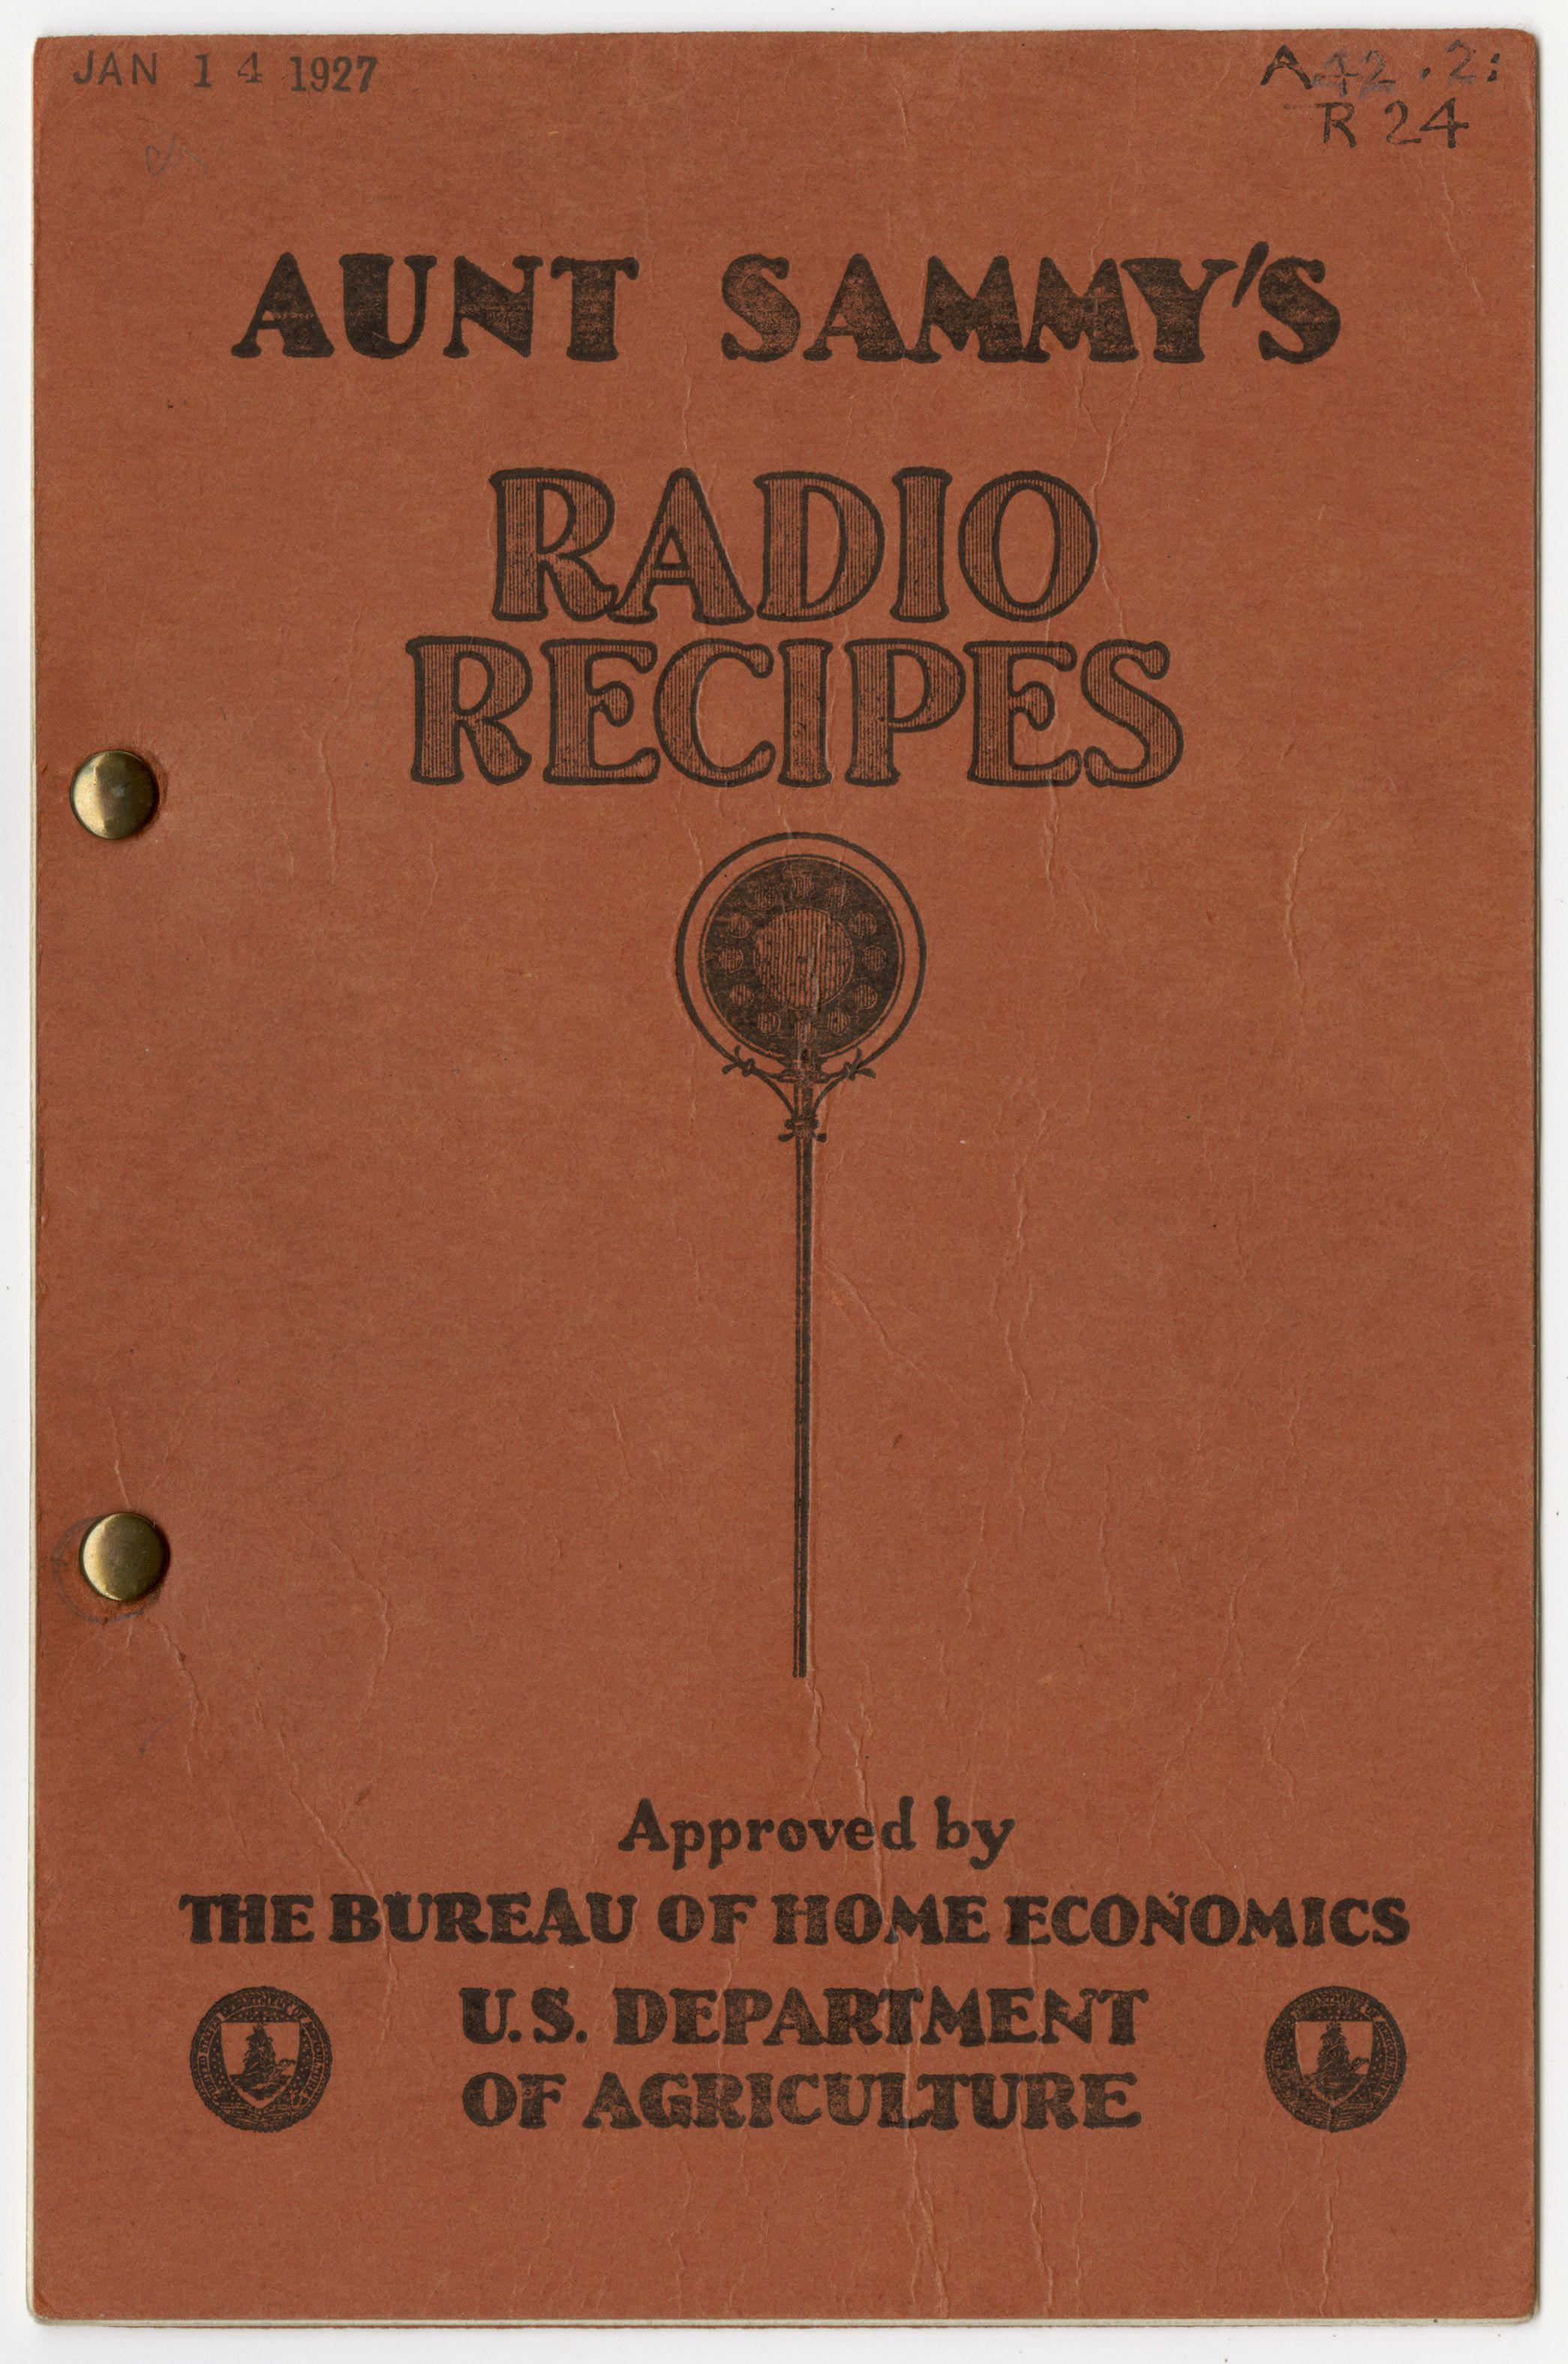 Aunt Sammy's Radio Recipes